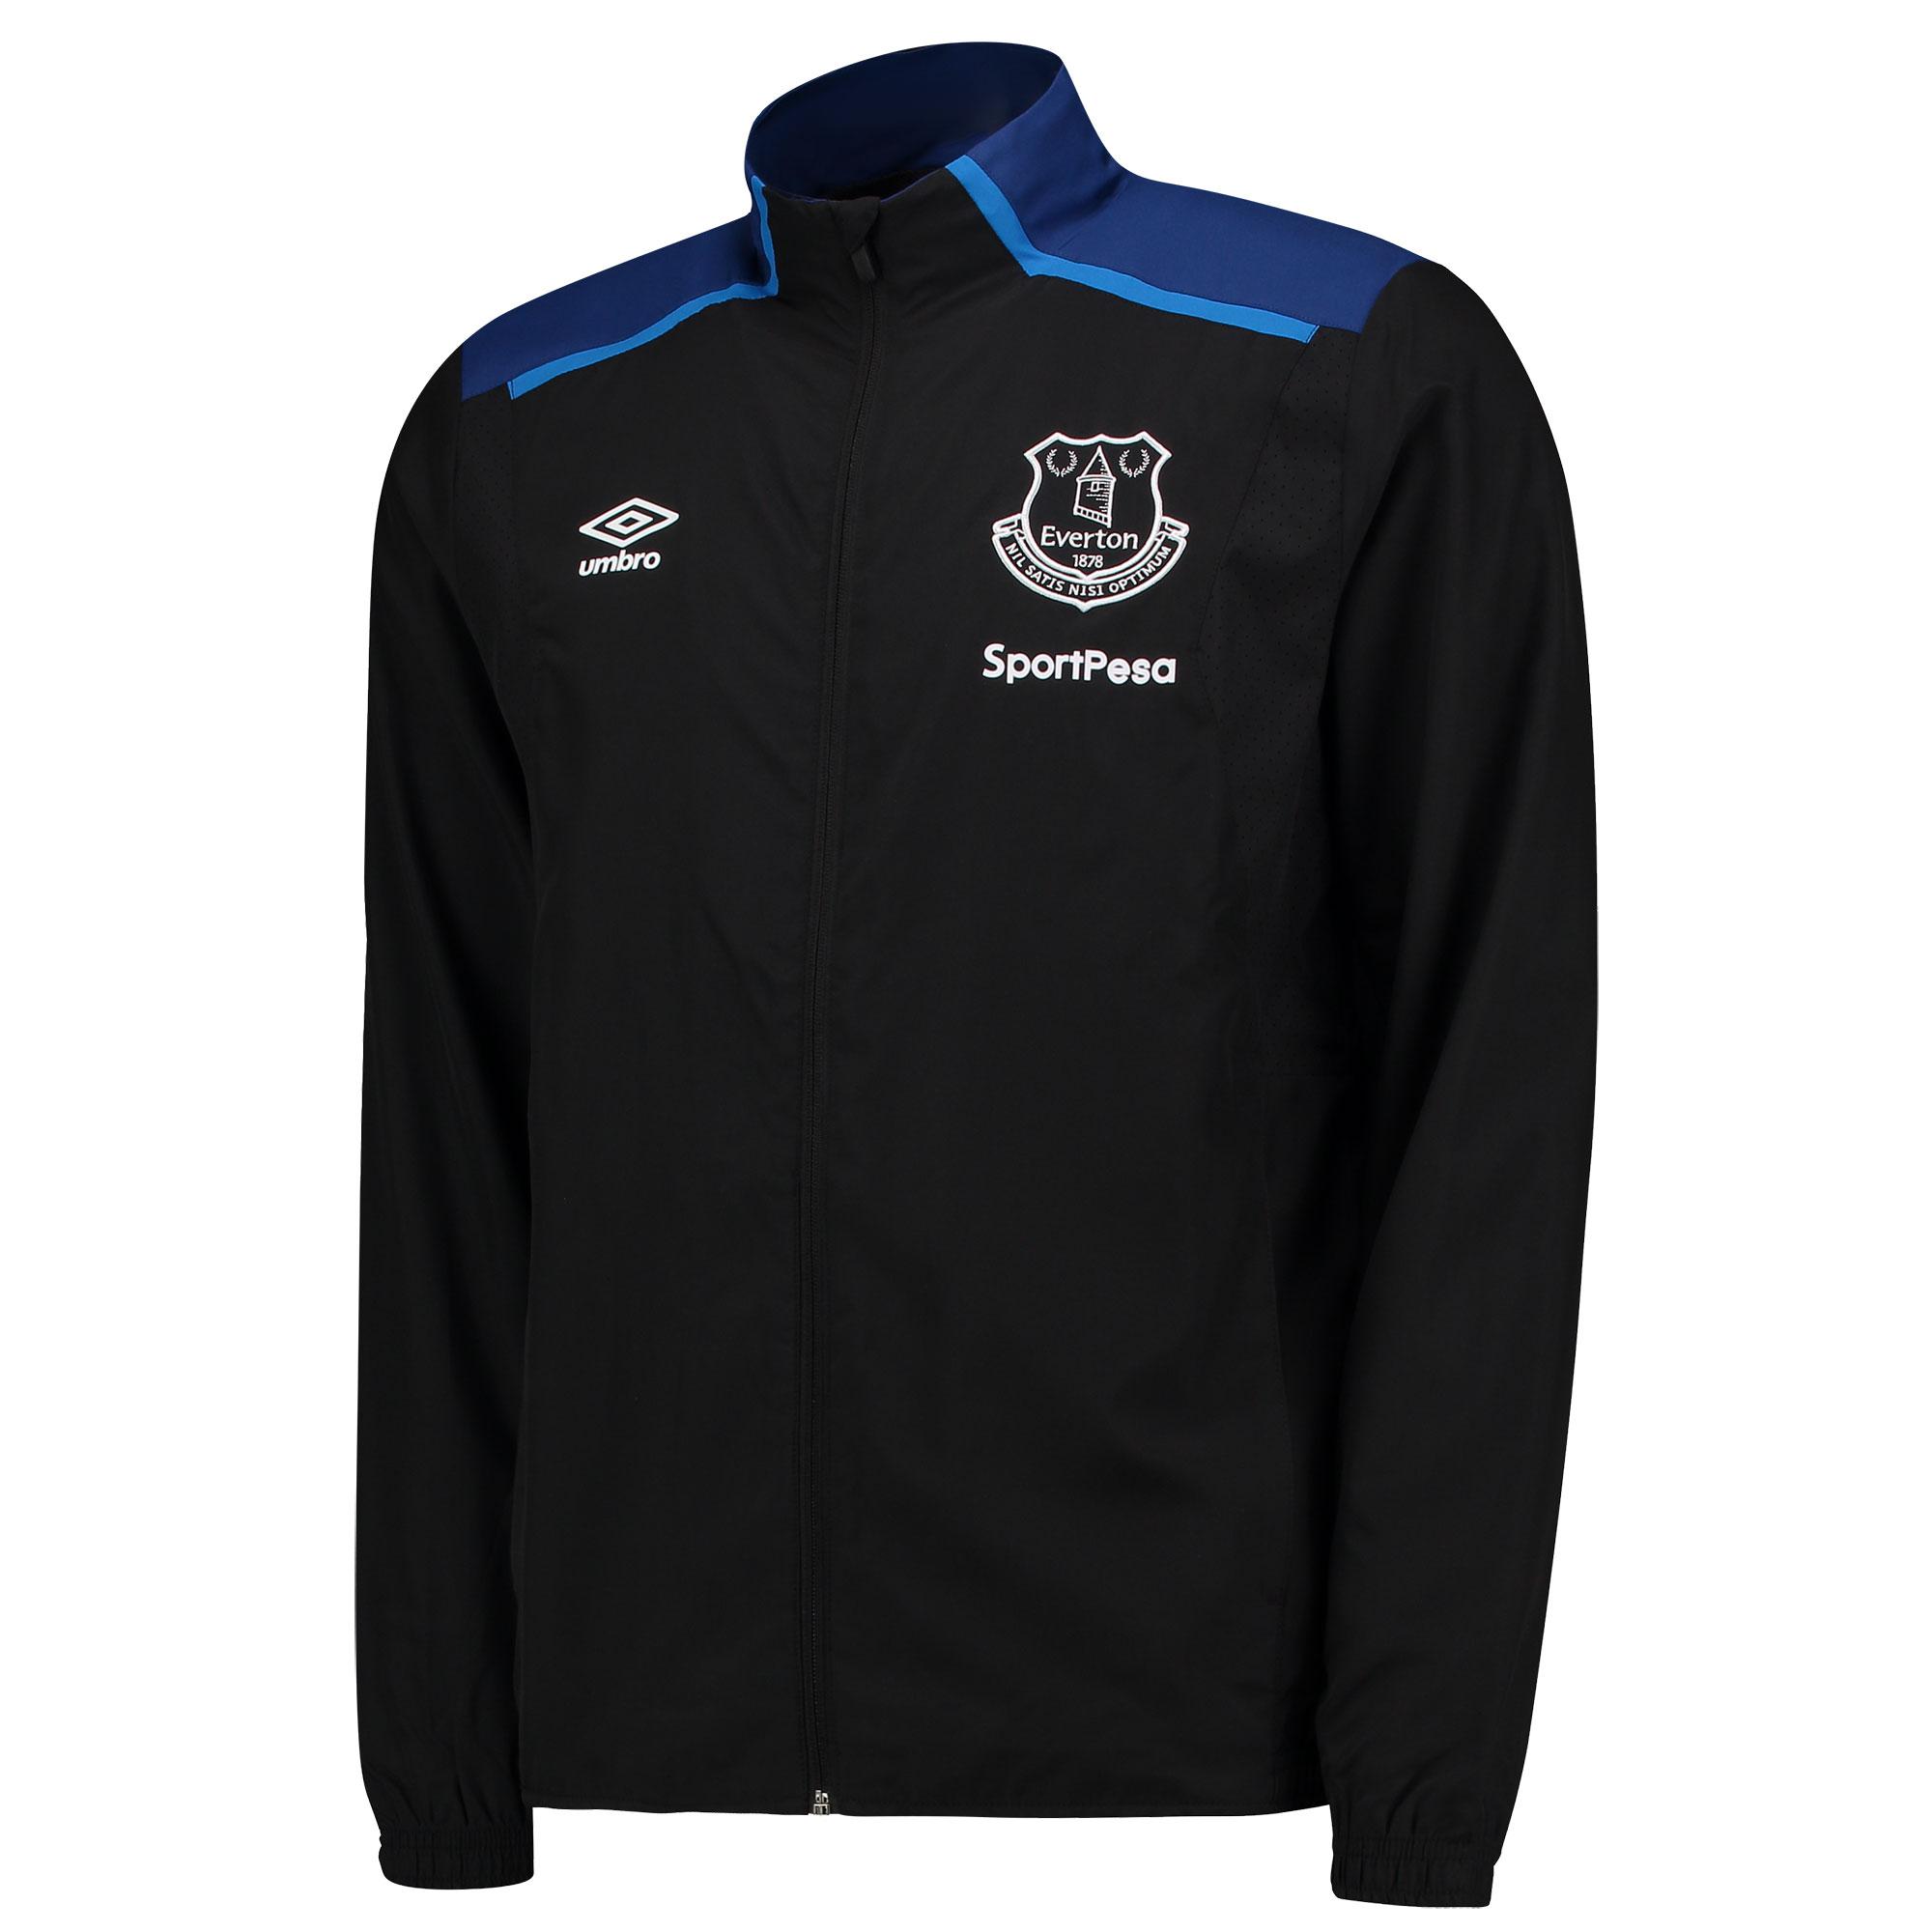 Everton Training Woven Jacket - Black/Sodalite Blue